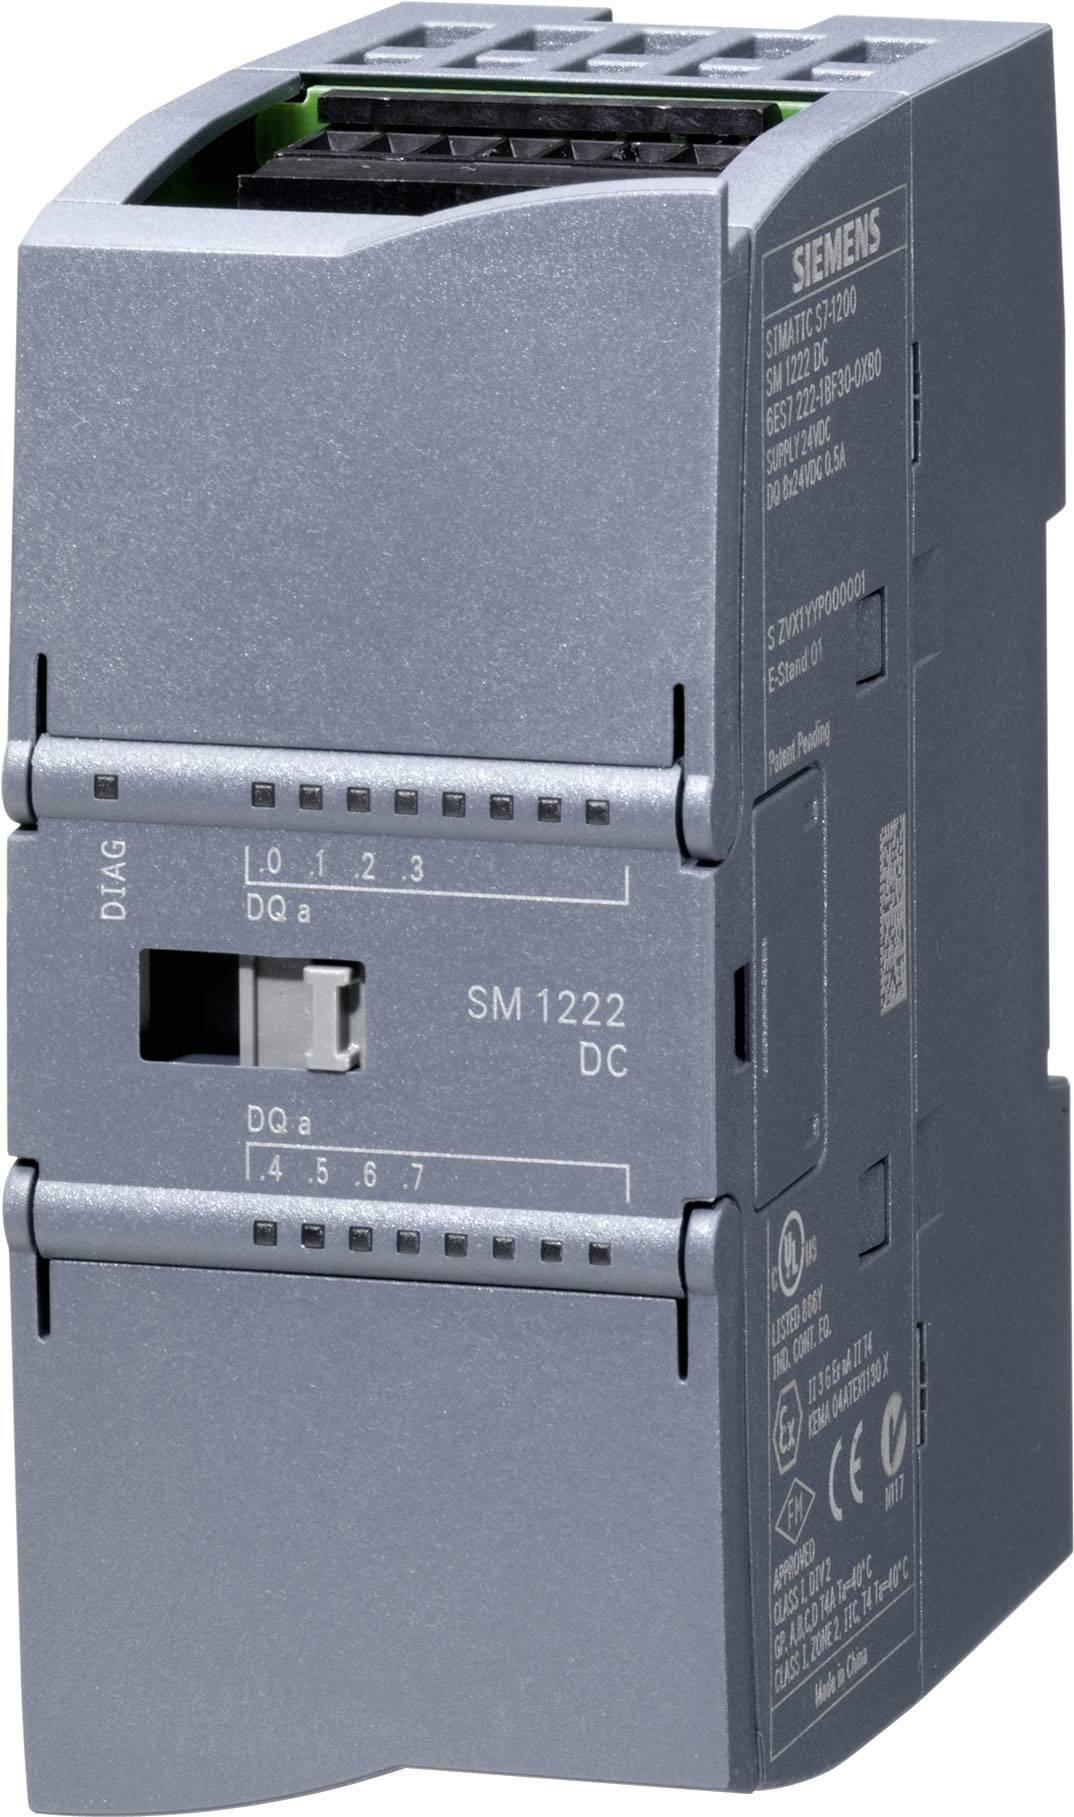 PLC rozširujúci modul Siemens SM 1222 6ES7222-1BF32-0XB0